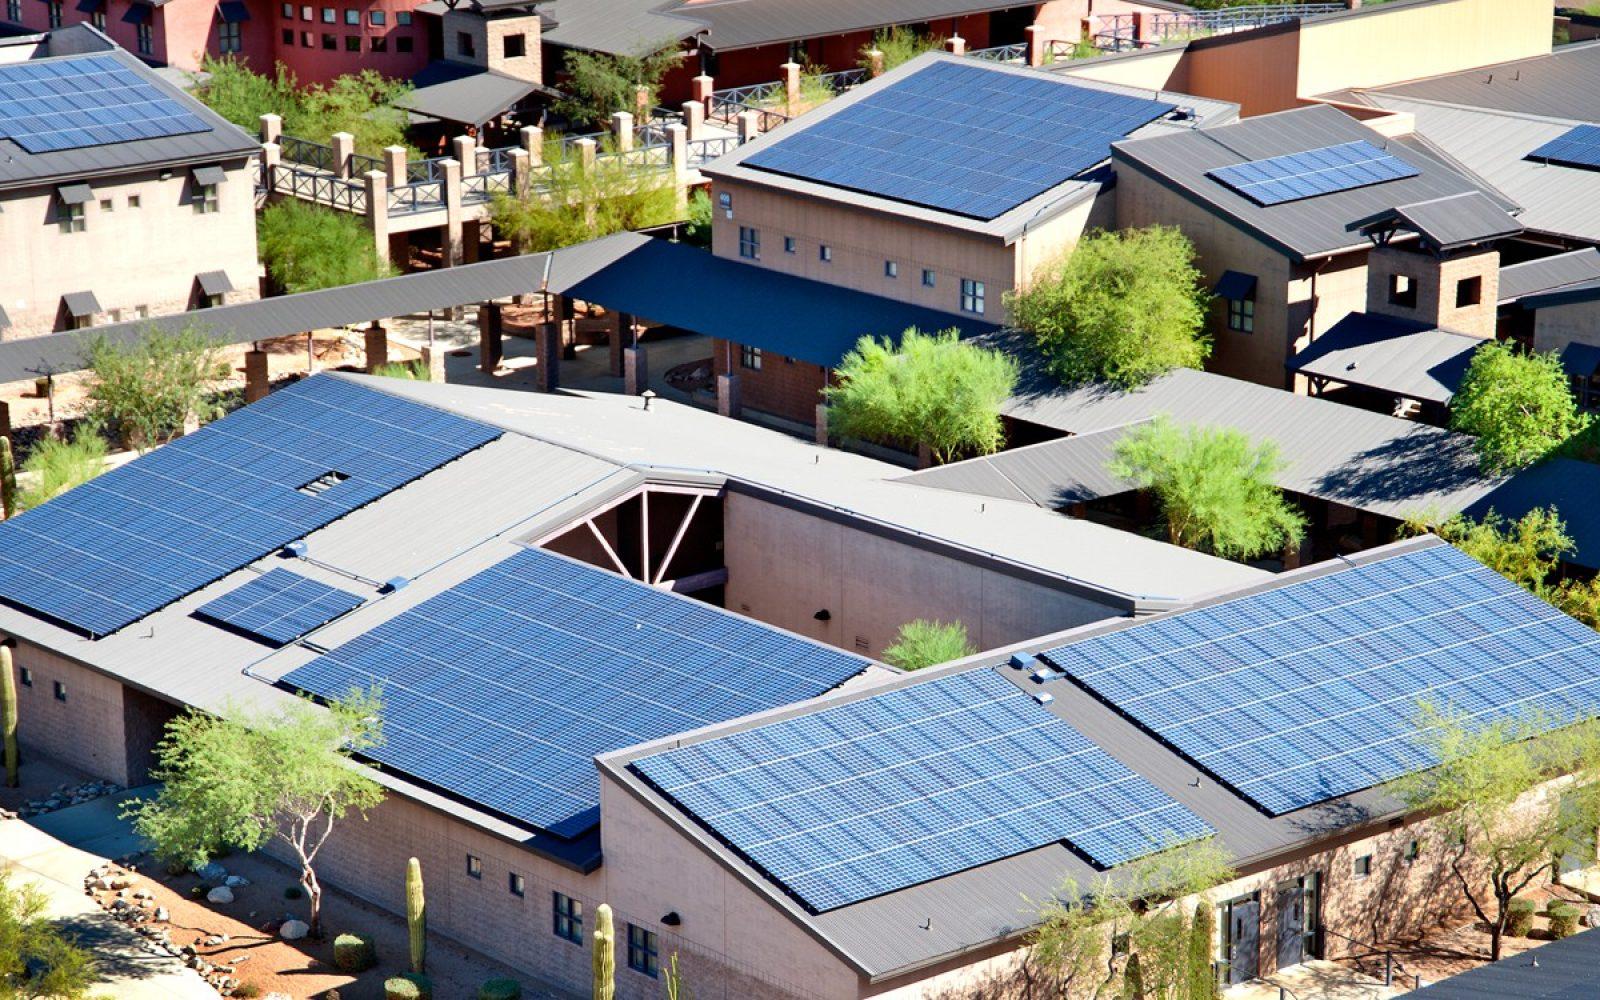 Solarcity Solar Panels >> Solarcity Sparked A War Of High Efficiency Solar Panels Electrek